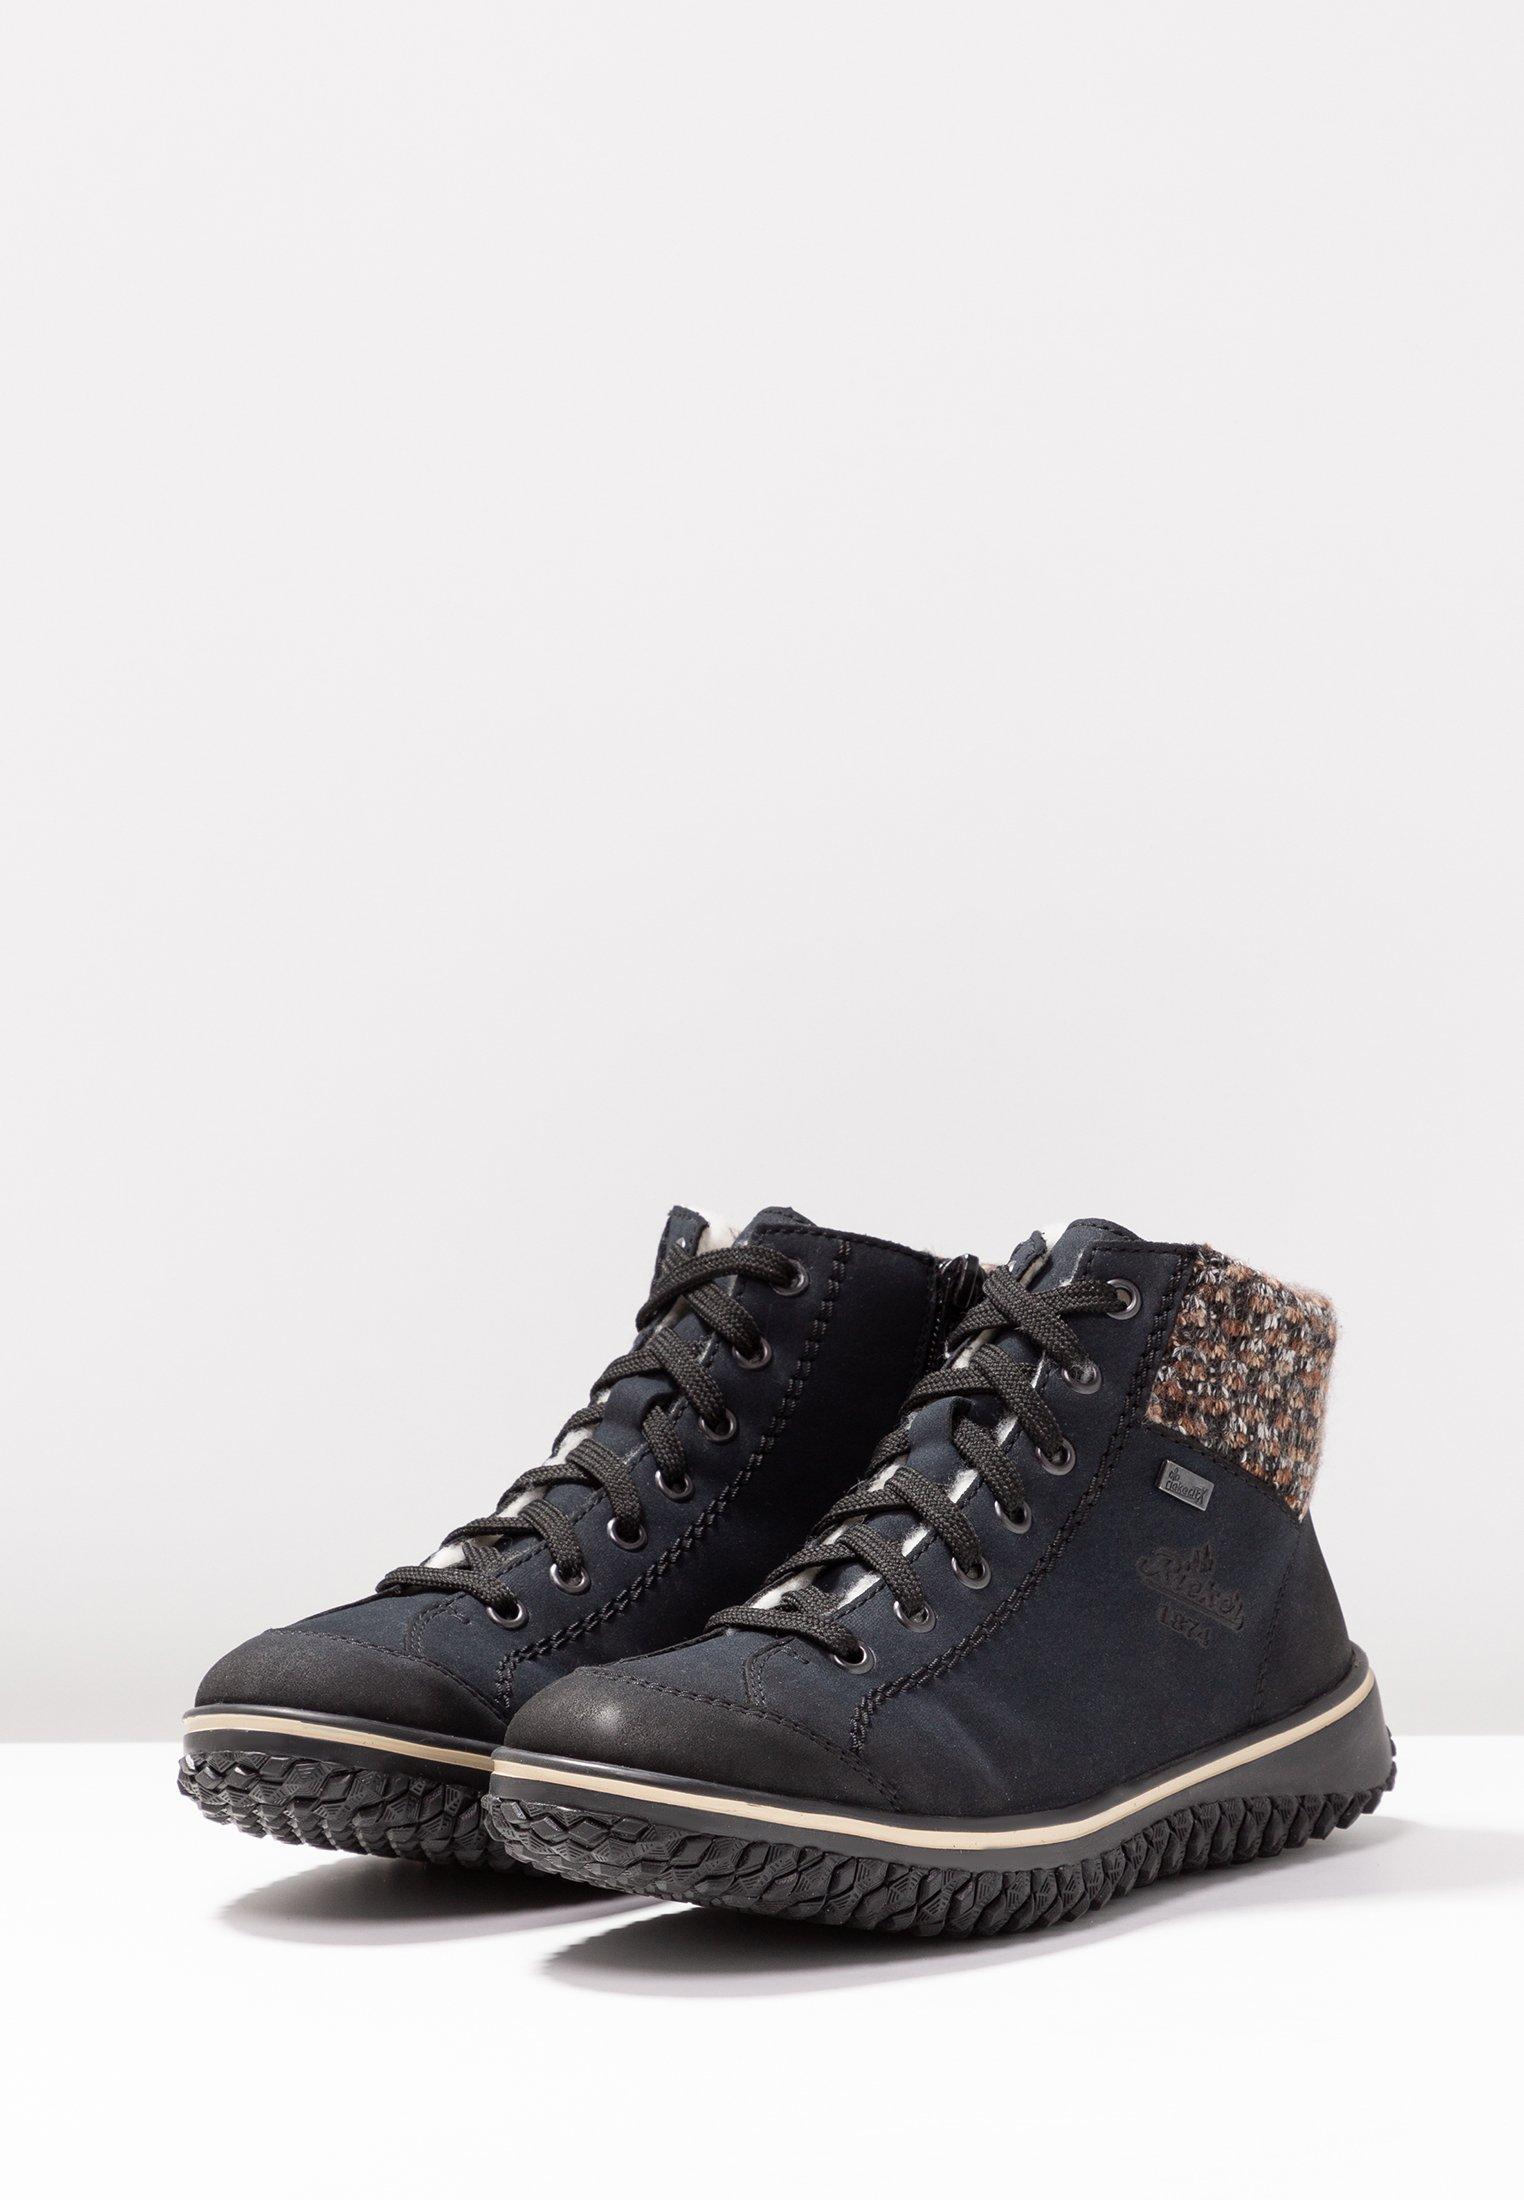 Rieker Ankle Boot pazifik/dunkelblau